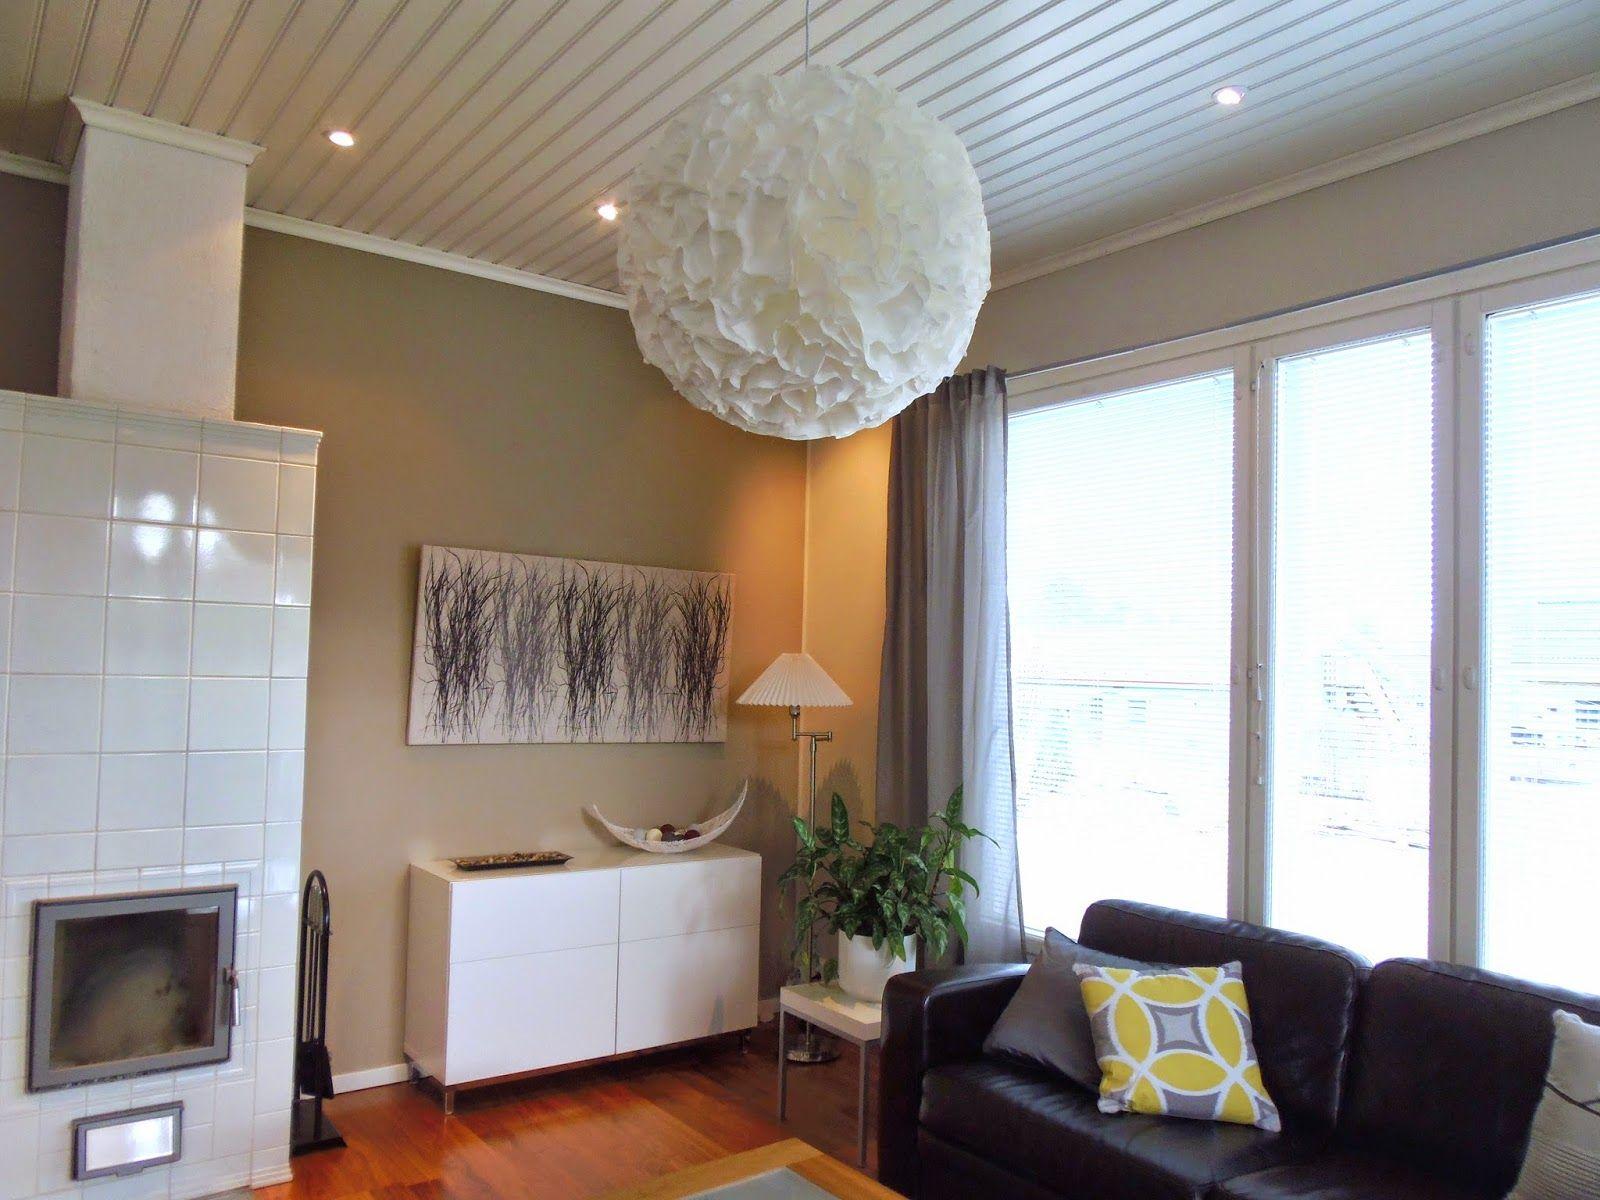 tavallista arkea: DIY, coffee filter light